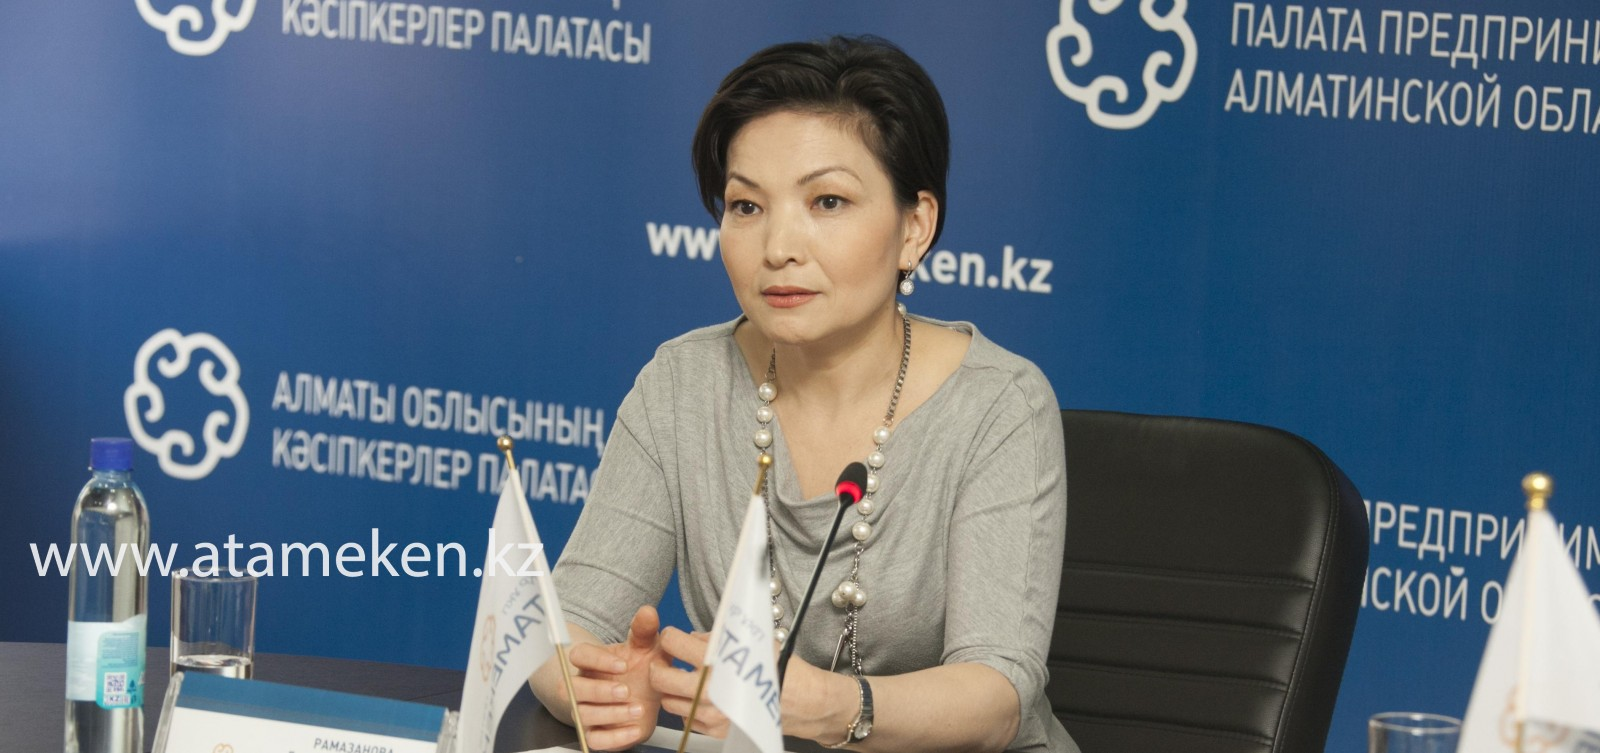 Предприятия Казахстана и Германии подписали контракты на сумму более 2 млрд евро за последние 4 года